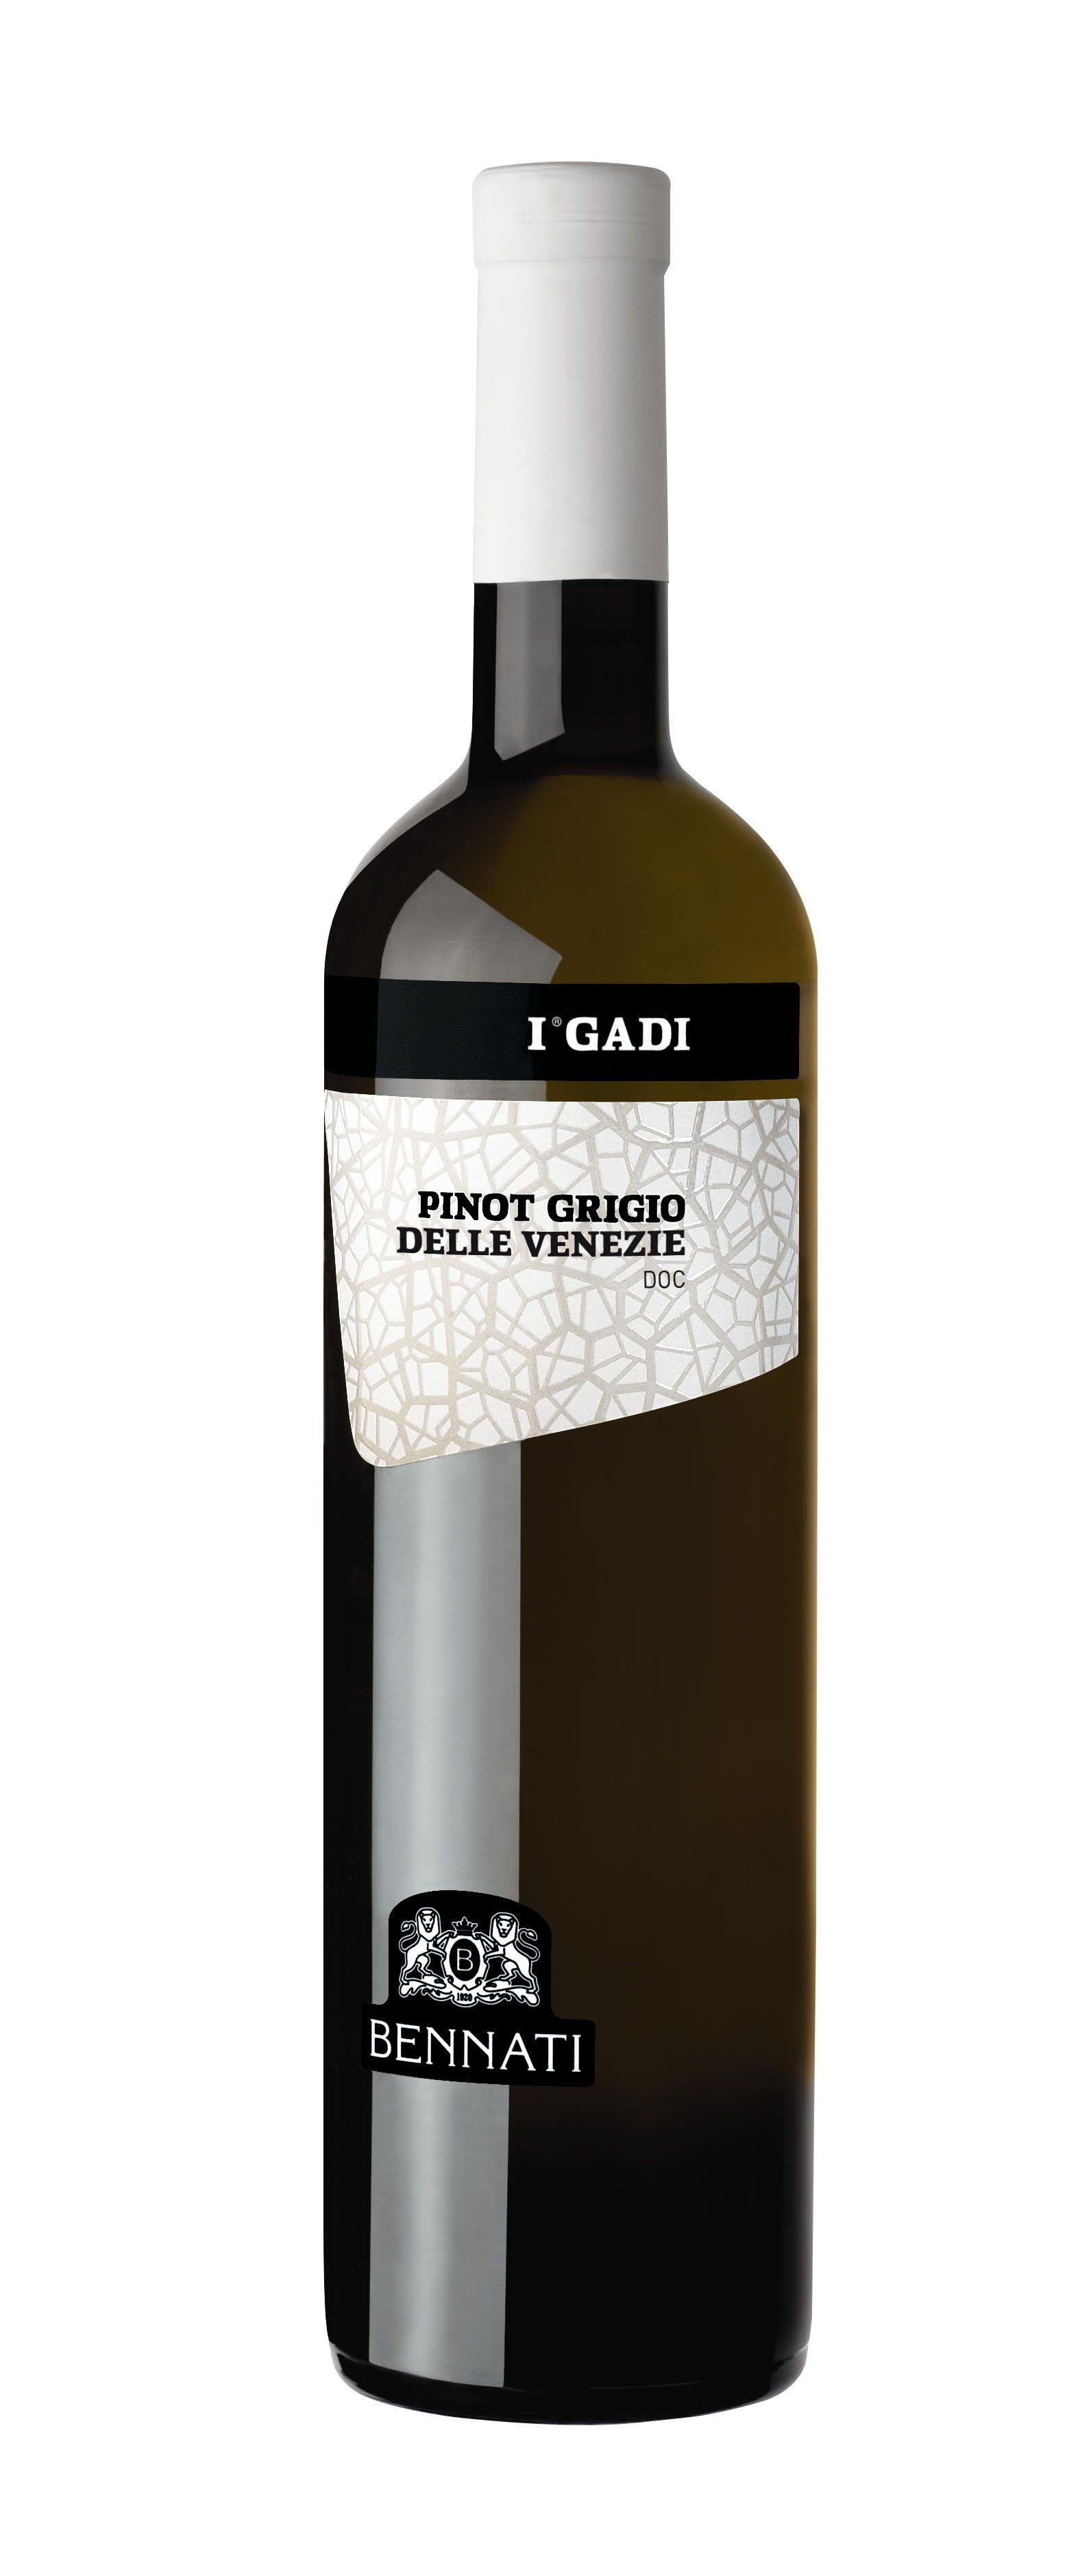 Pinot grigio Delle Venezie DOC 'I Gadi' - Bennati